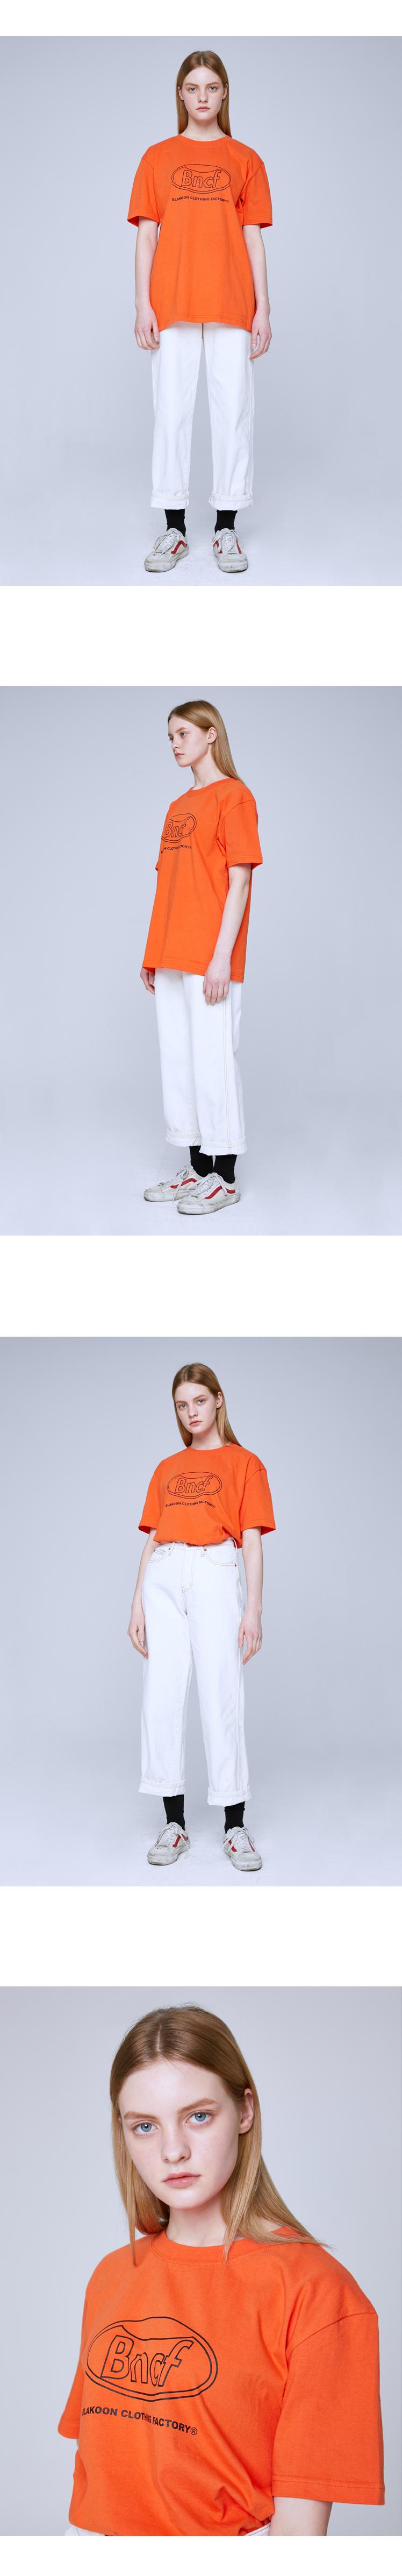 BNCF-서클-로고-티셔츠_03.jpg